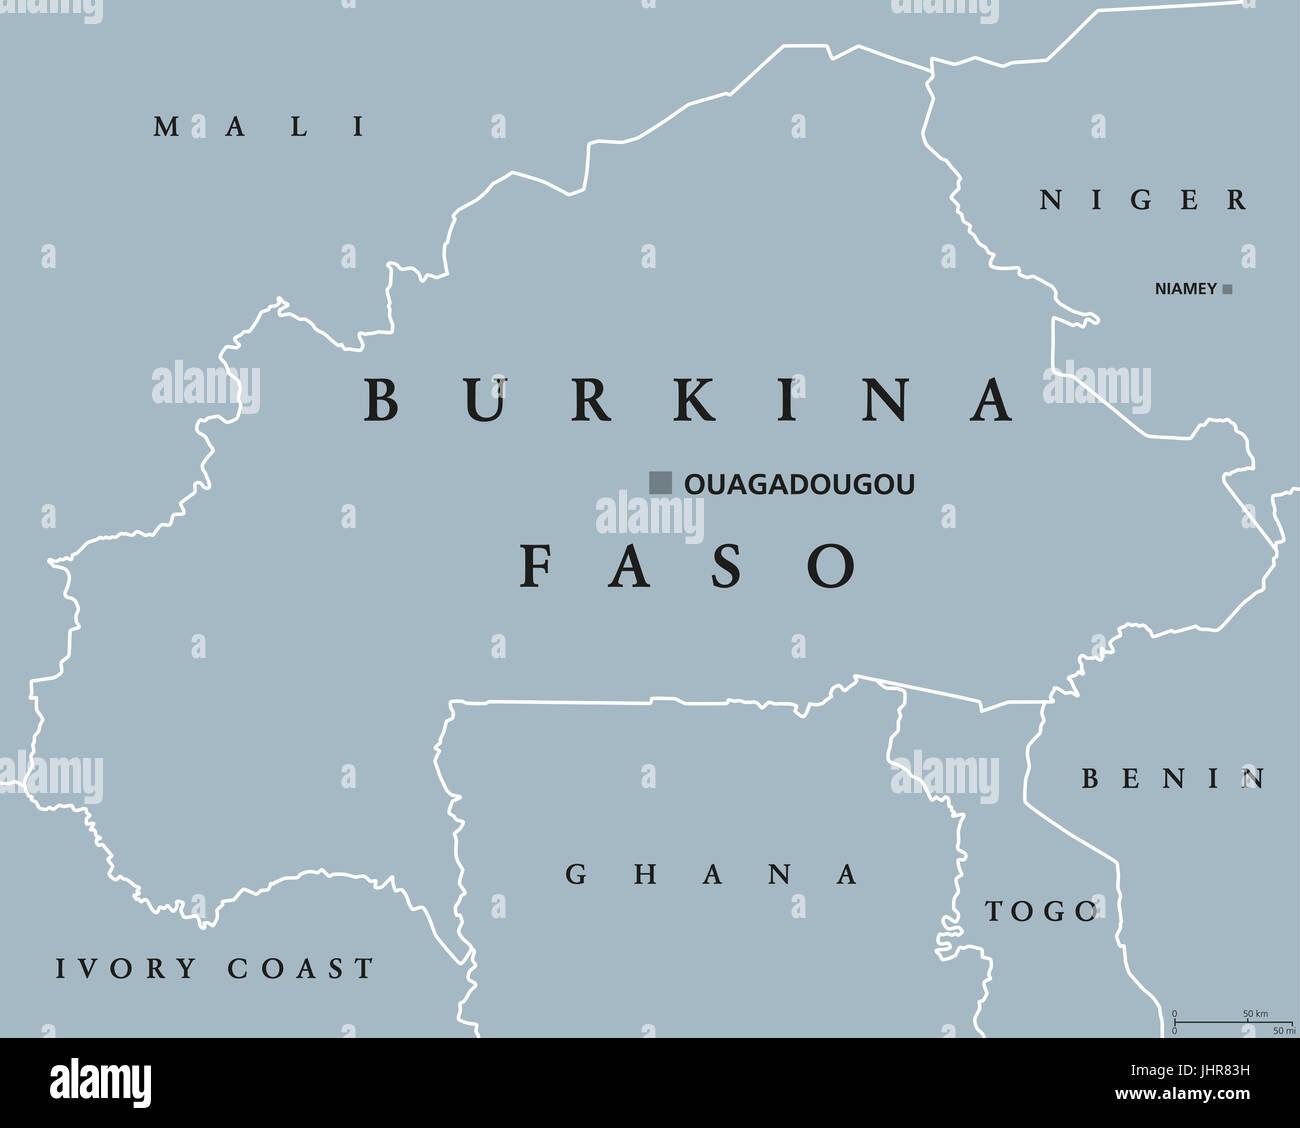 Burkina Faso political map with capital Ouagadougou Landlocked